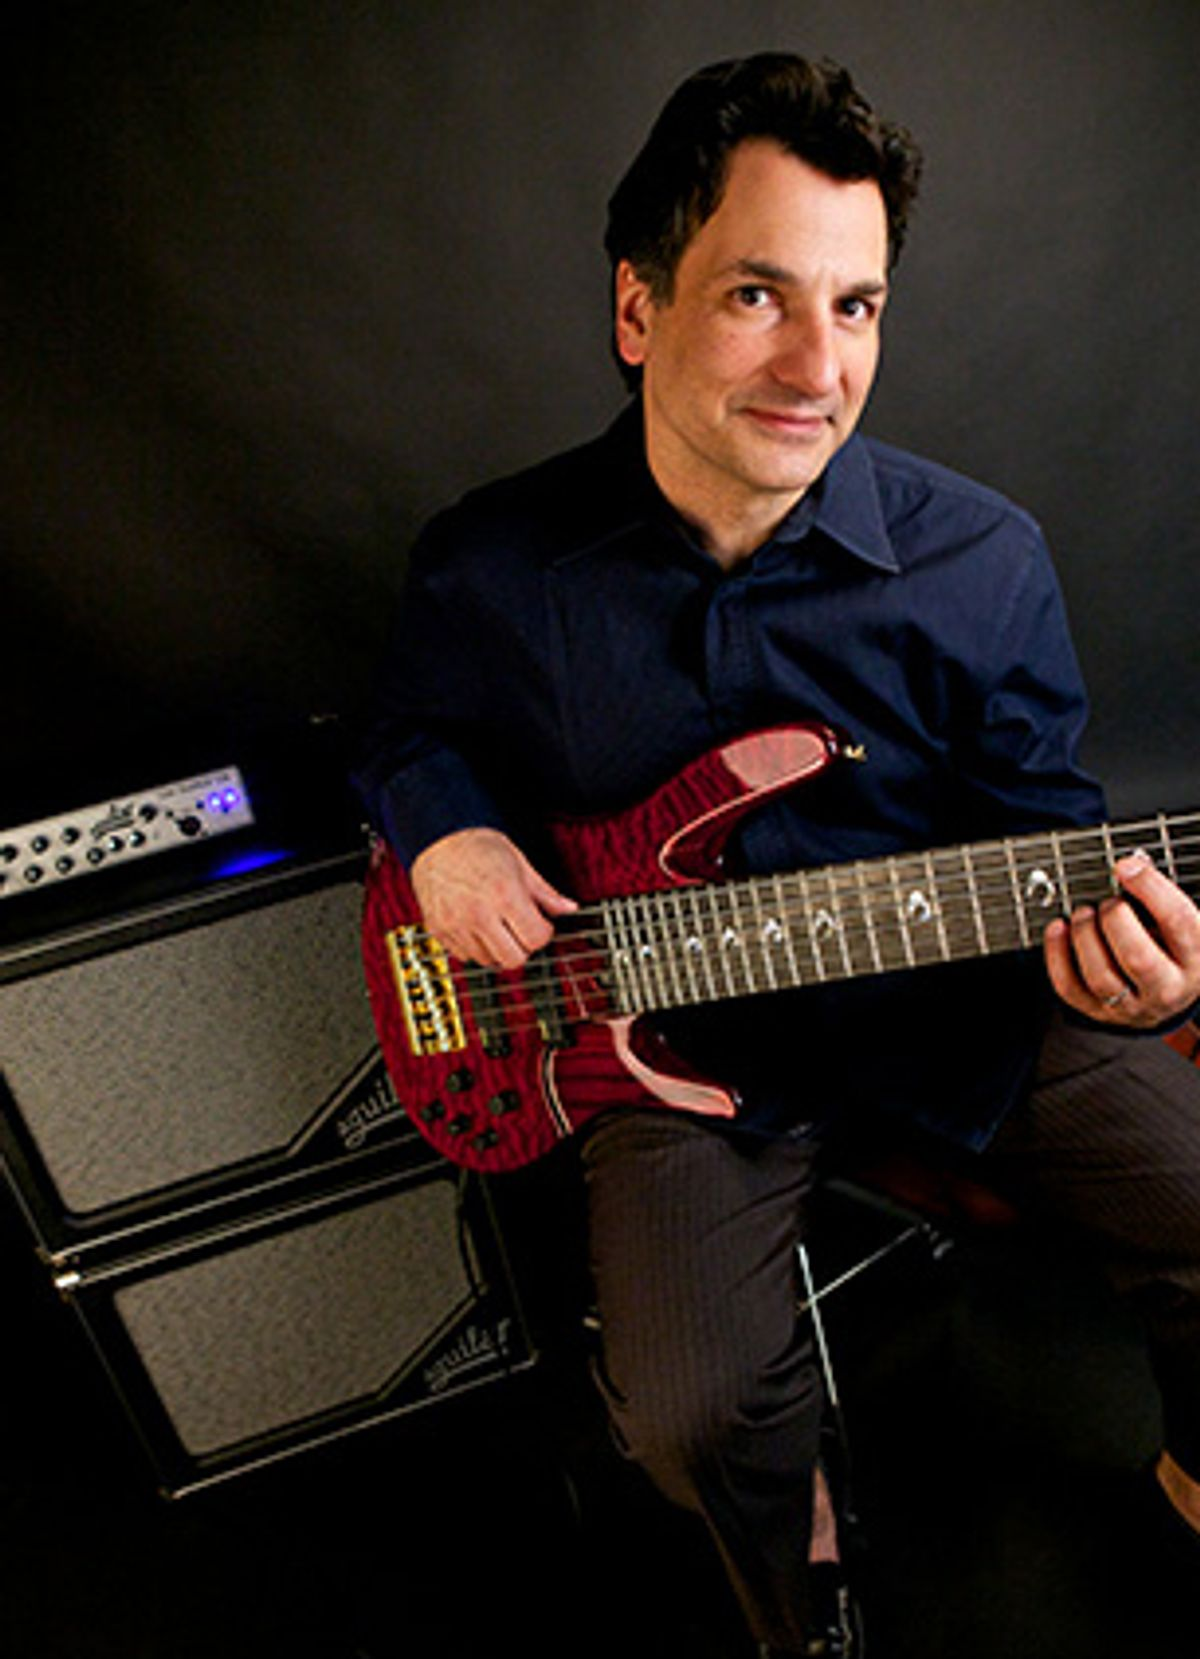 Aguilar Amplification Announces Masterclass with John Patitucci